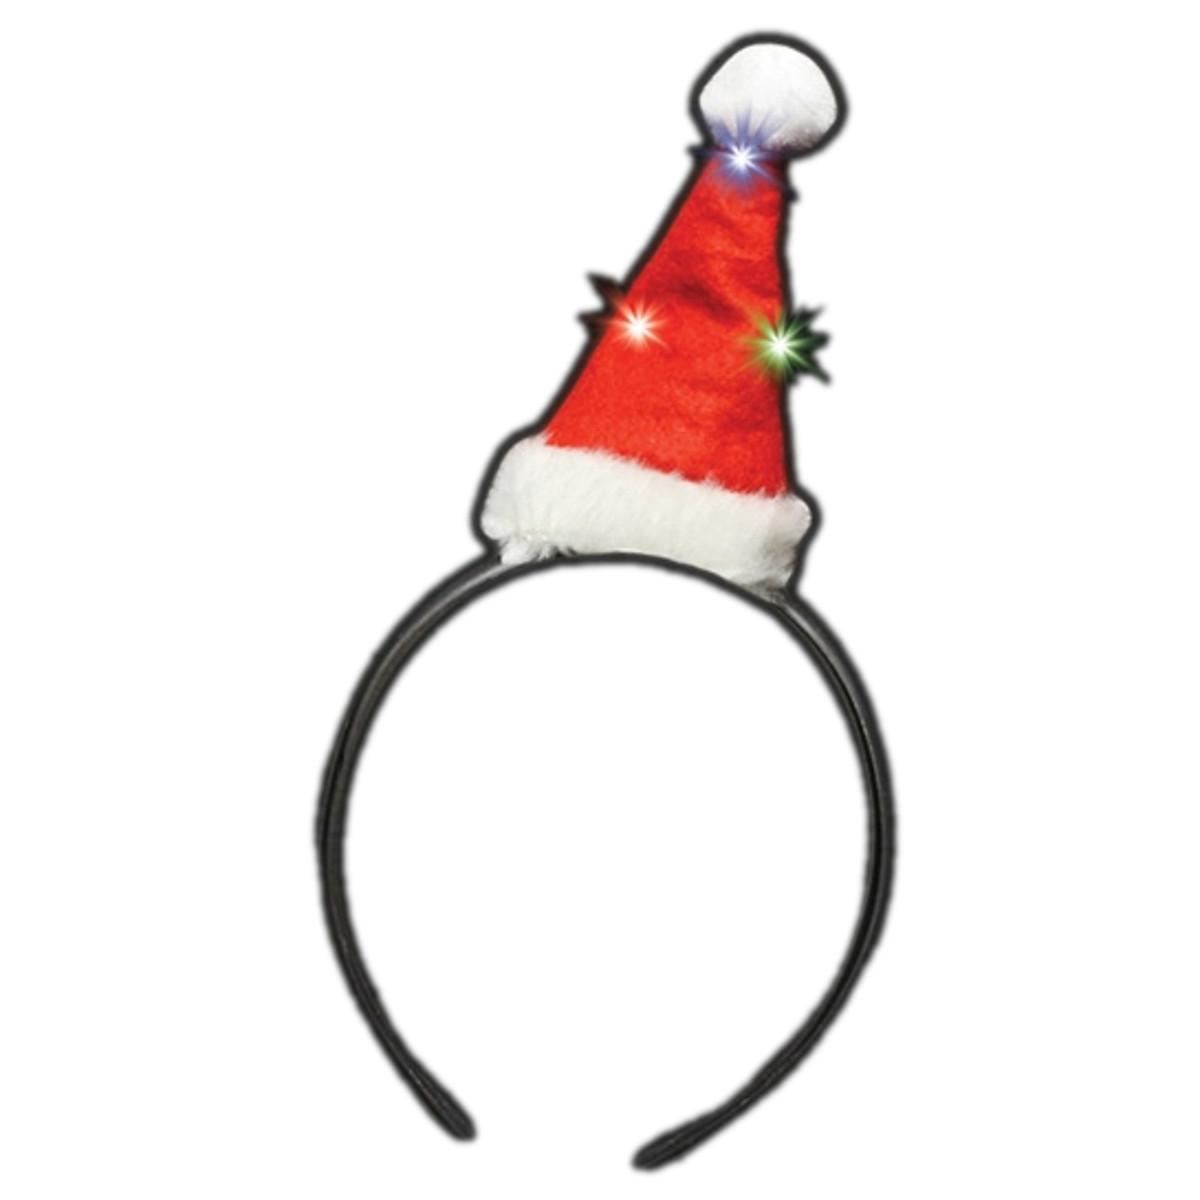 Flashing Mini Santa Hat Light Up Headband All Products